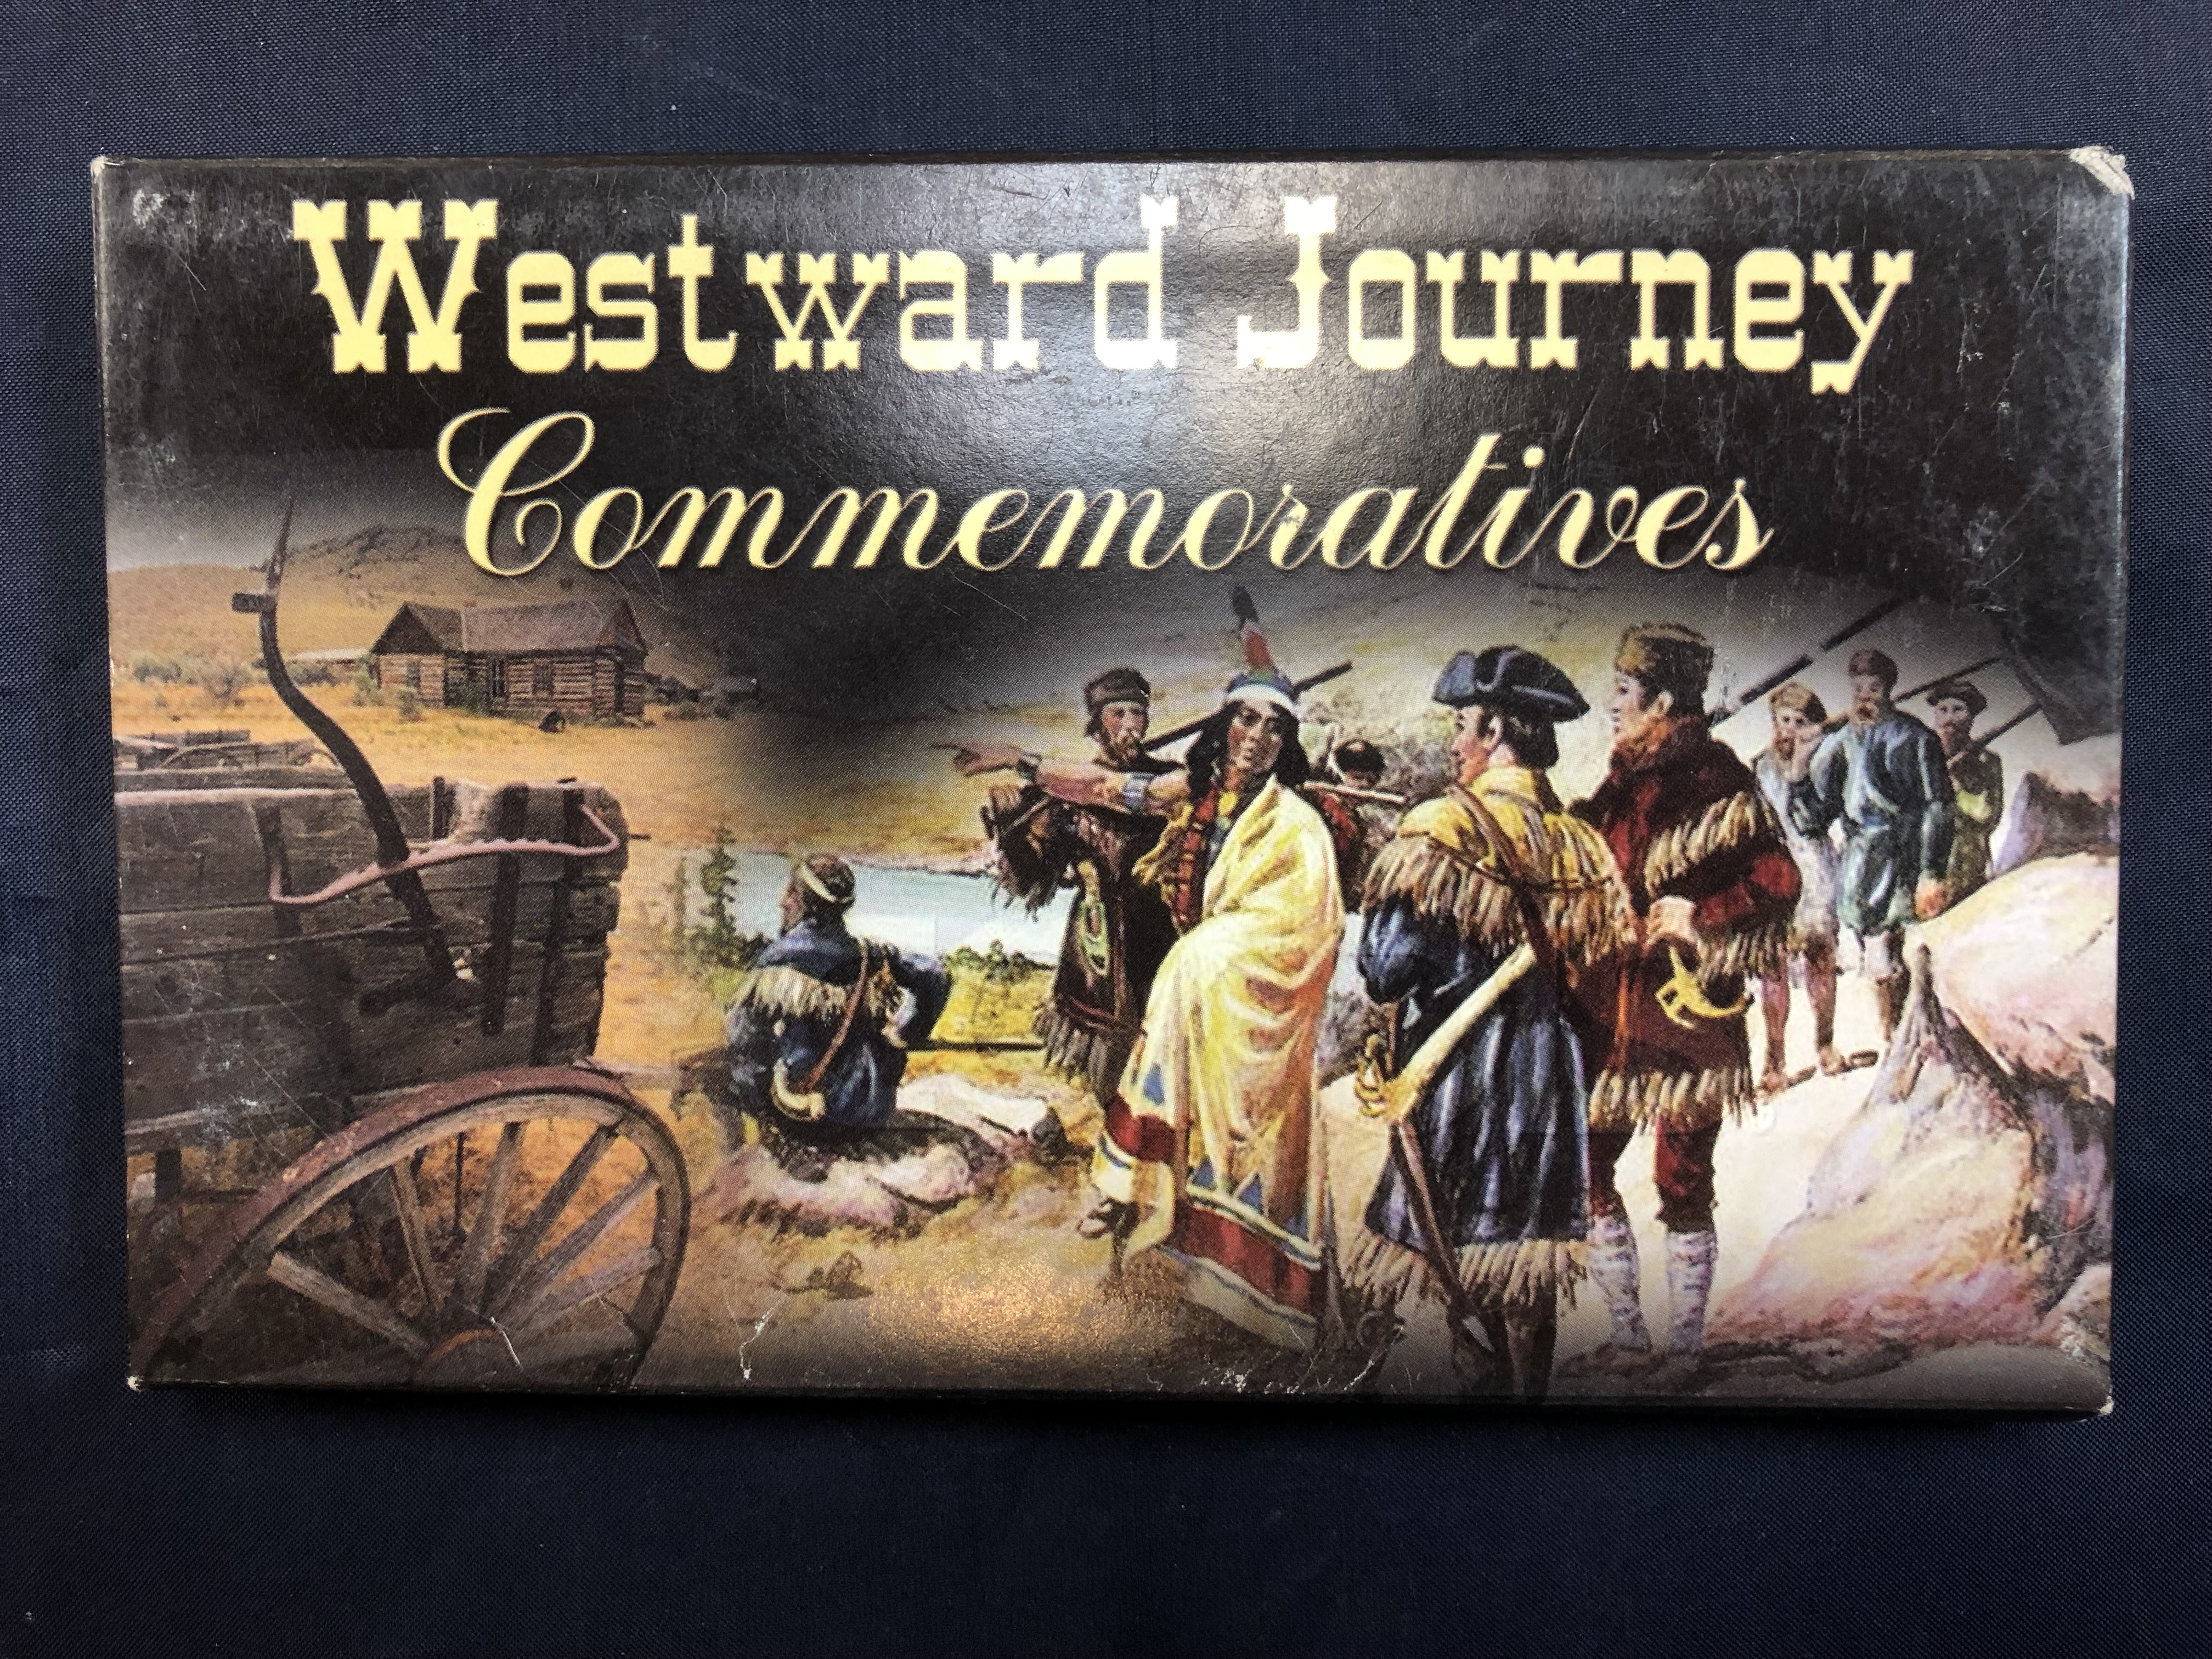 US COINS - THE WESTWARD JOURNEY KEELBOAT 2004 PHILADELPHIA DENVER PLATINUM EDITION